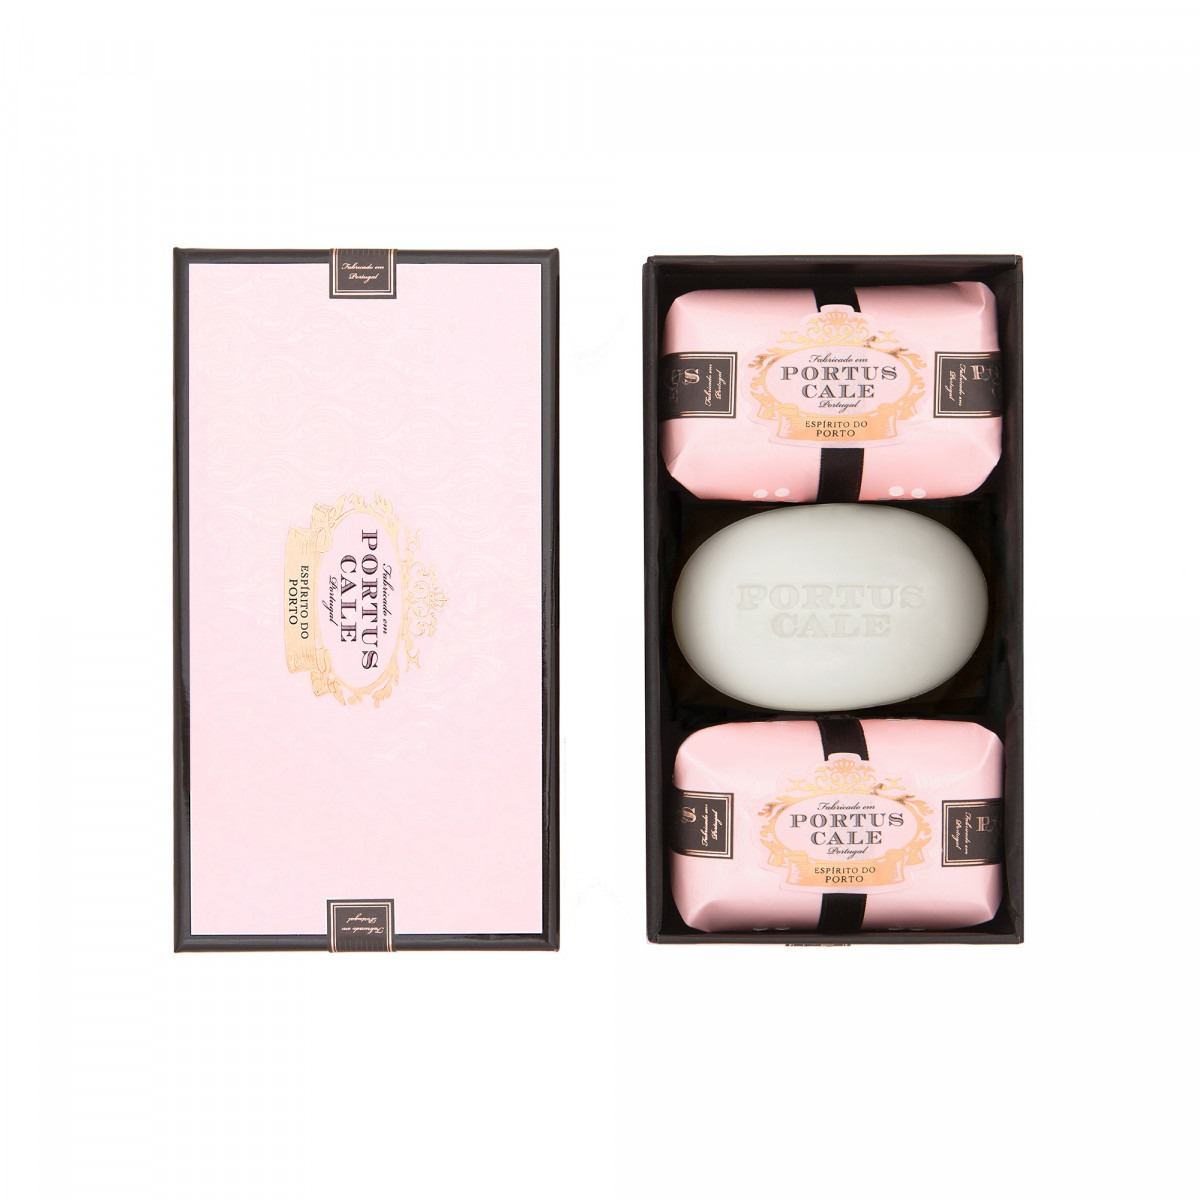 Portus Cale Rose Blush 3x150g Box of Soaps